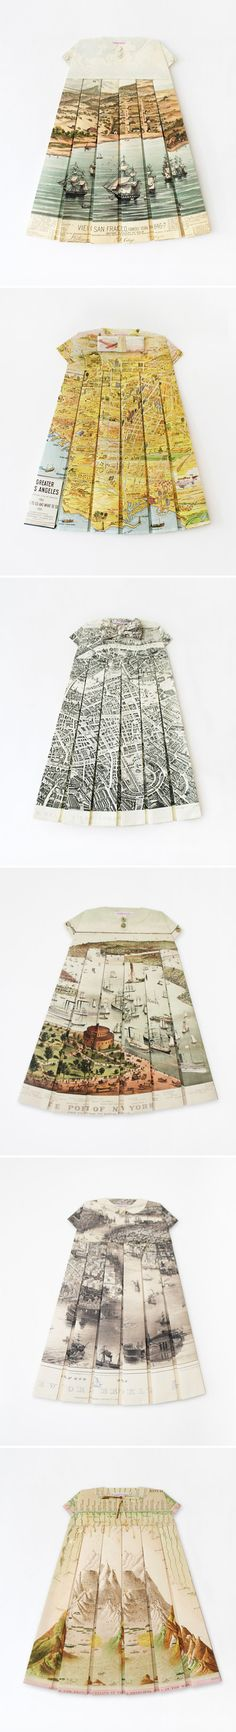 ELISABETH LECOURT - vintage maps folded into tiny dresses <3